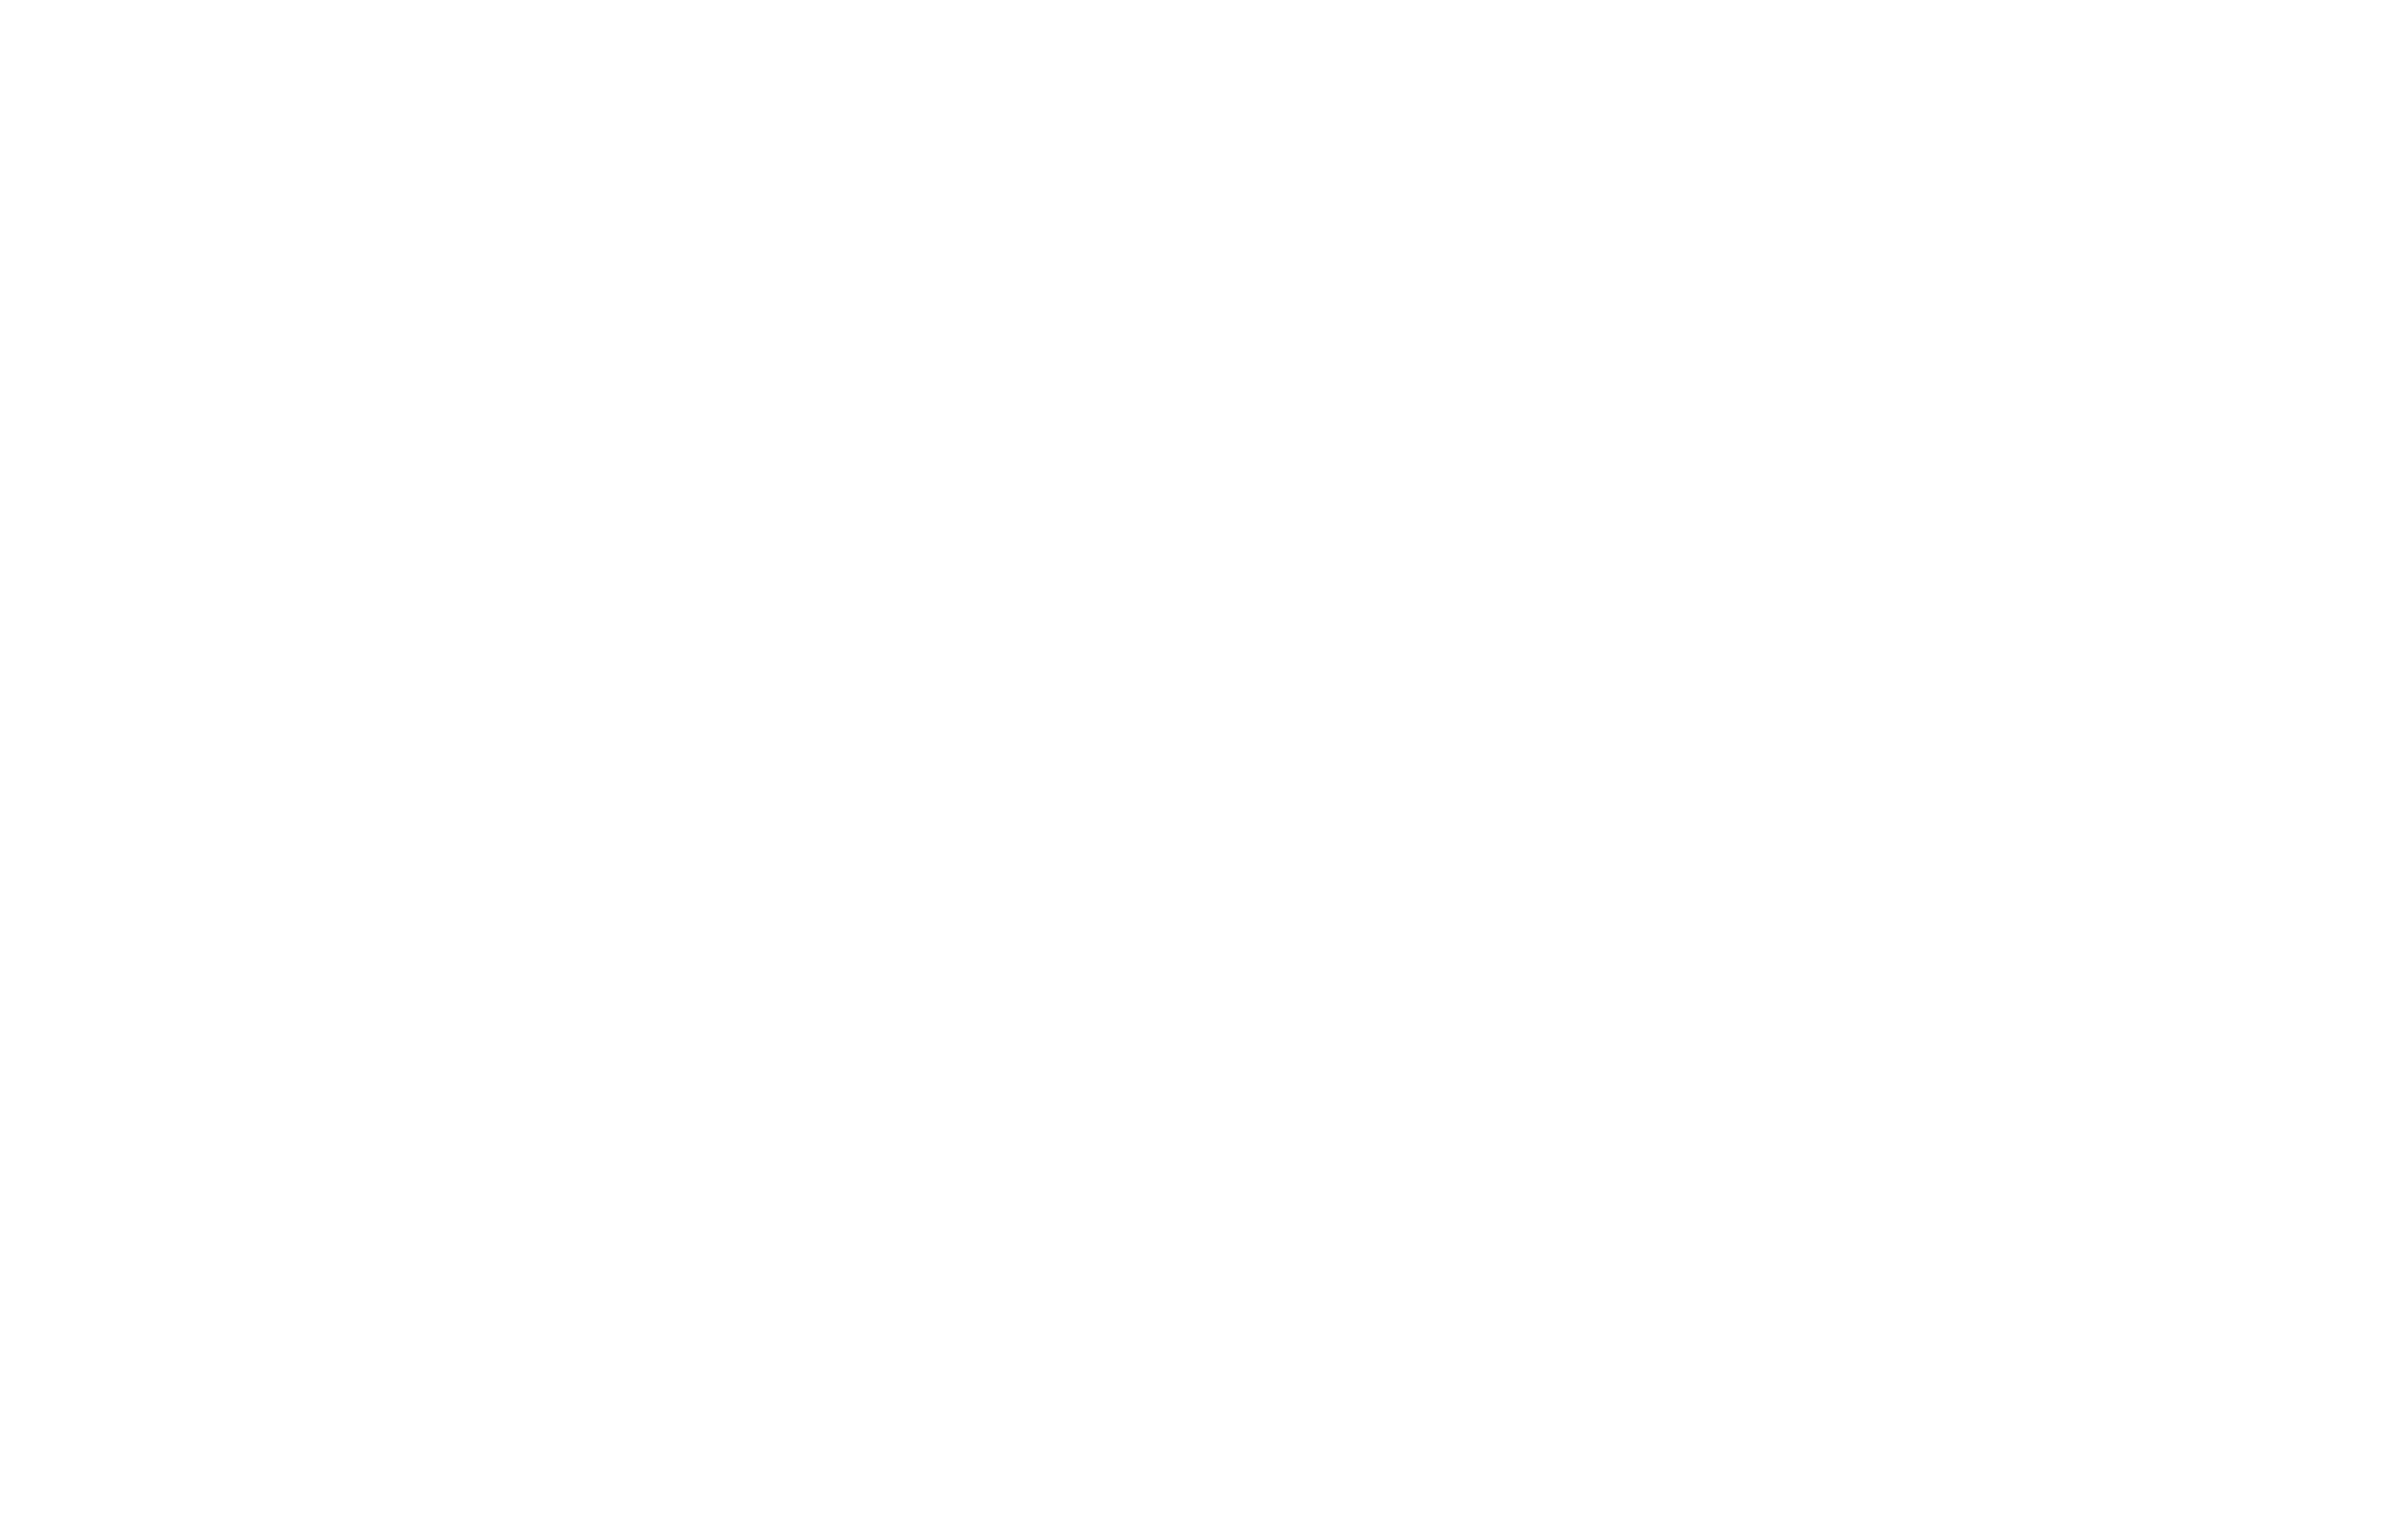 Whaddon Grove House